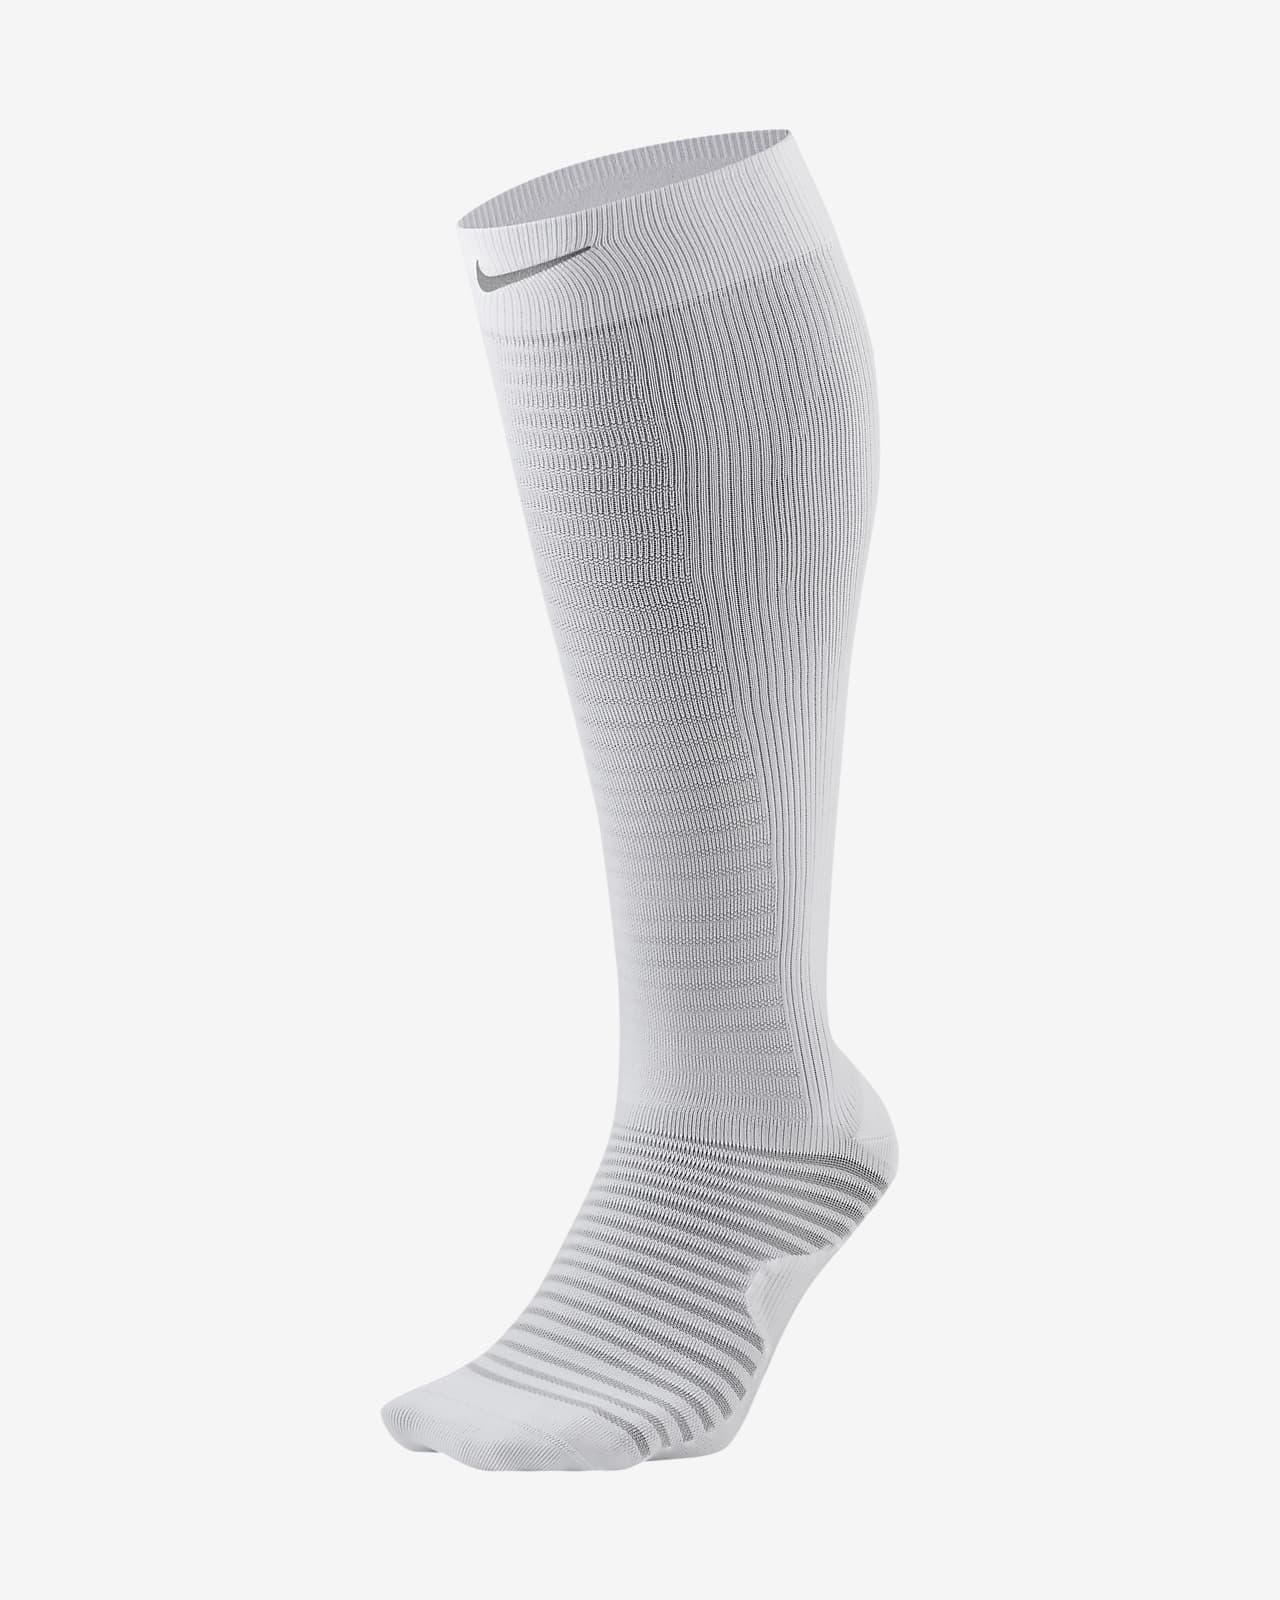 Nike Spark Lightweight Over-The-Calf Compression Running Socks